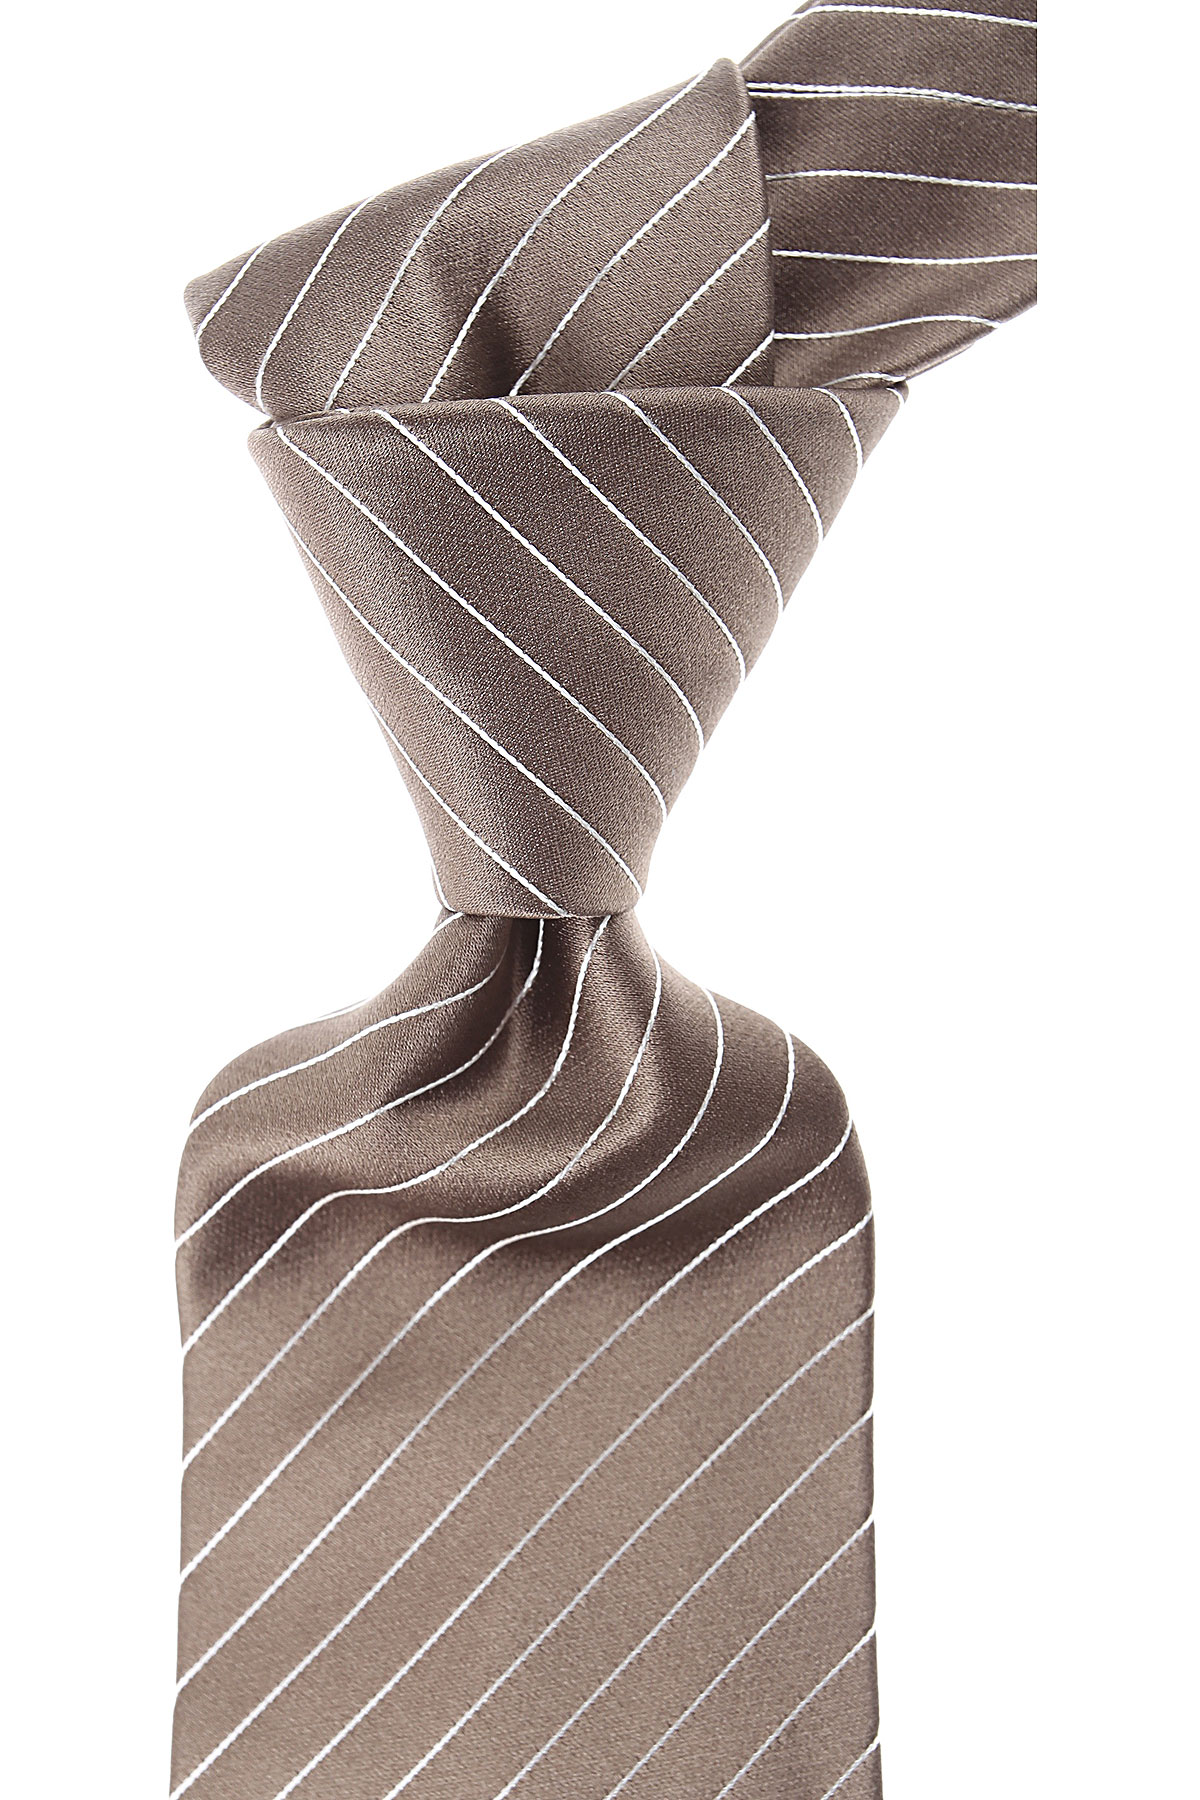 Moschino Cravates Pas cher en Soldes, Vert olive, Soie, 2019